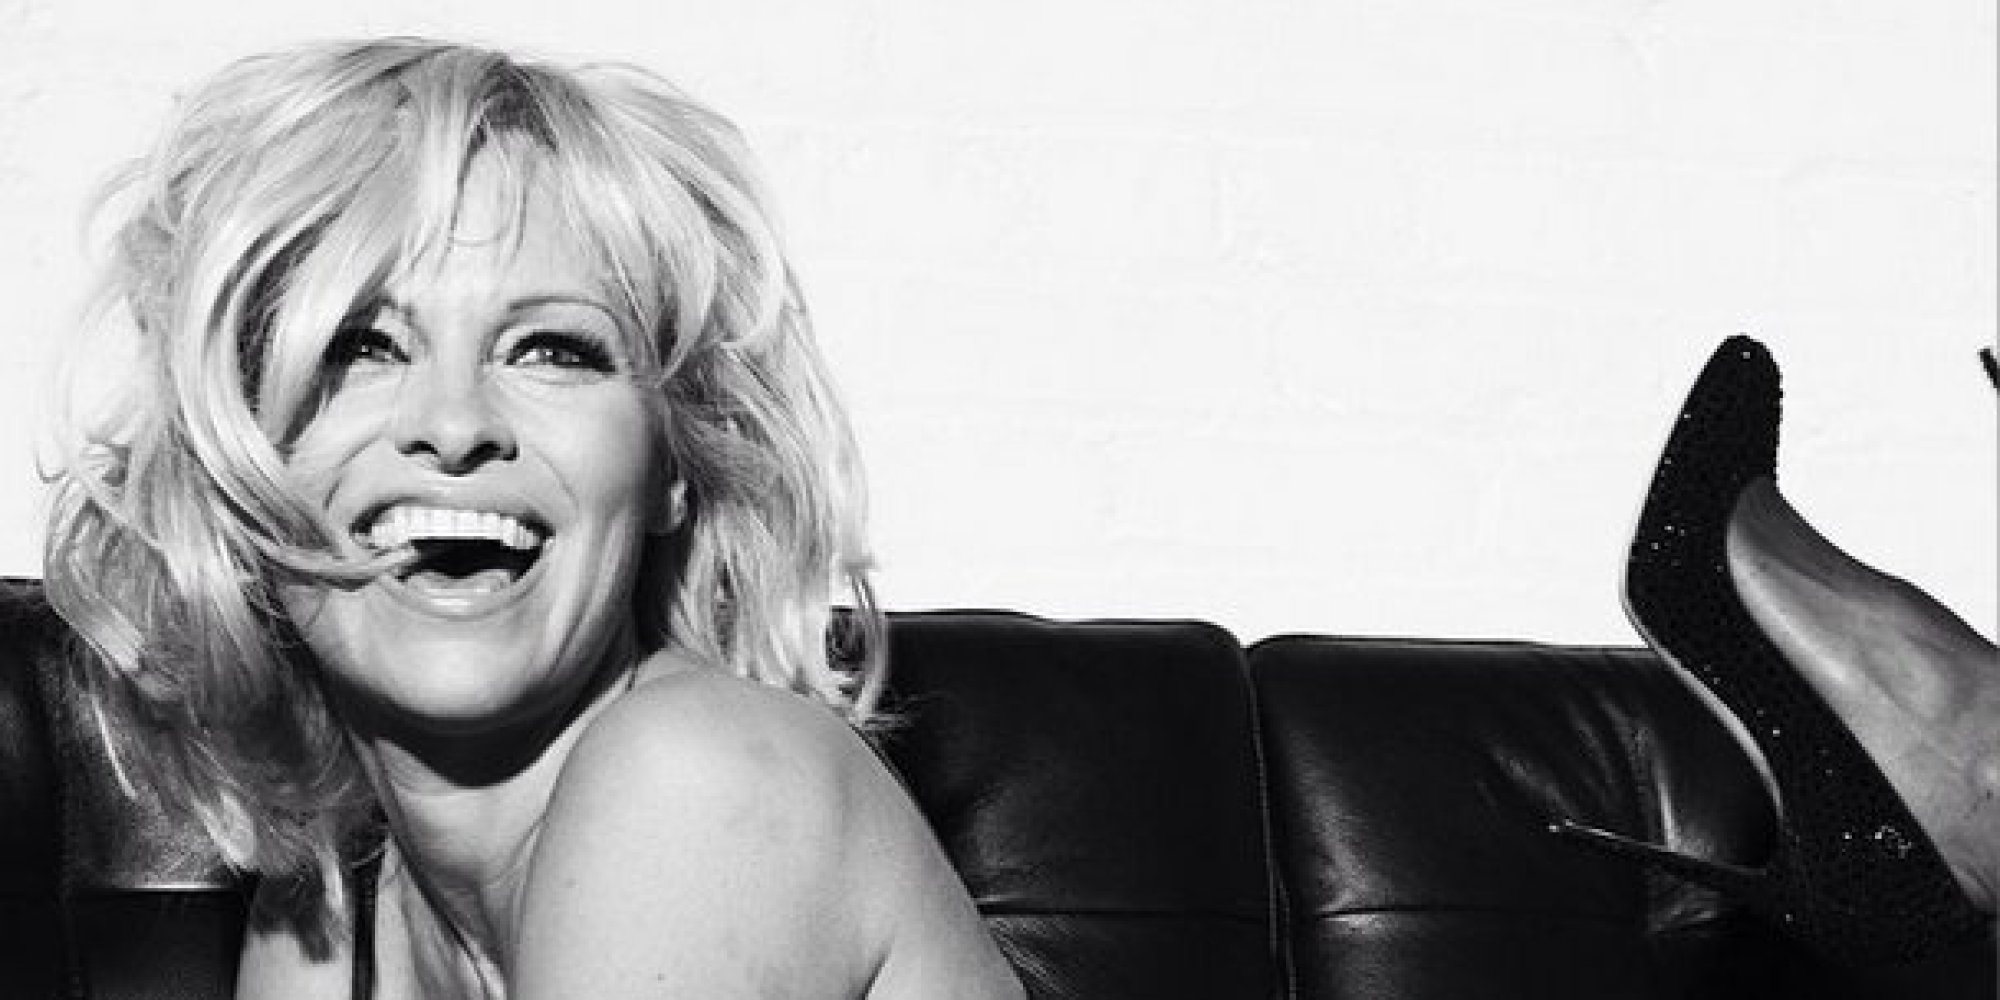 Pamela Anderson LOVE Advent 2014 - 2019 year